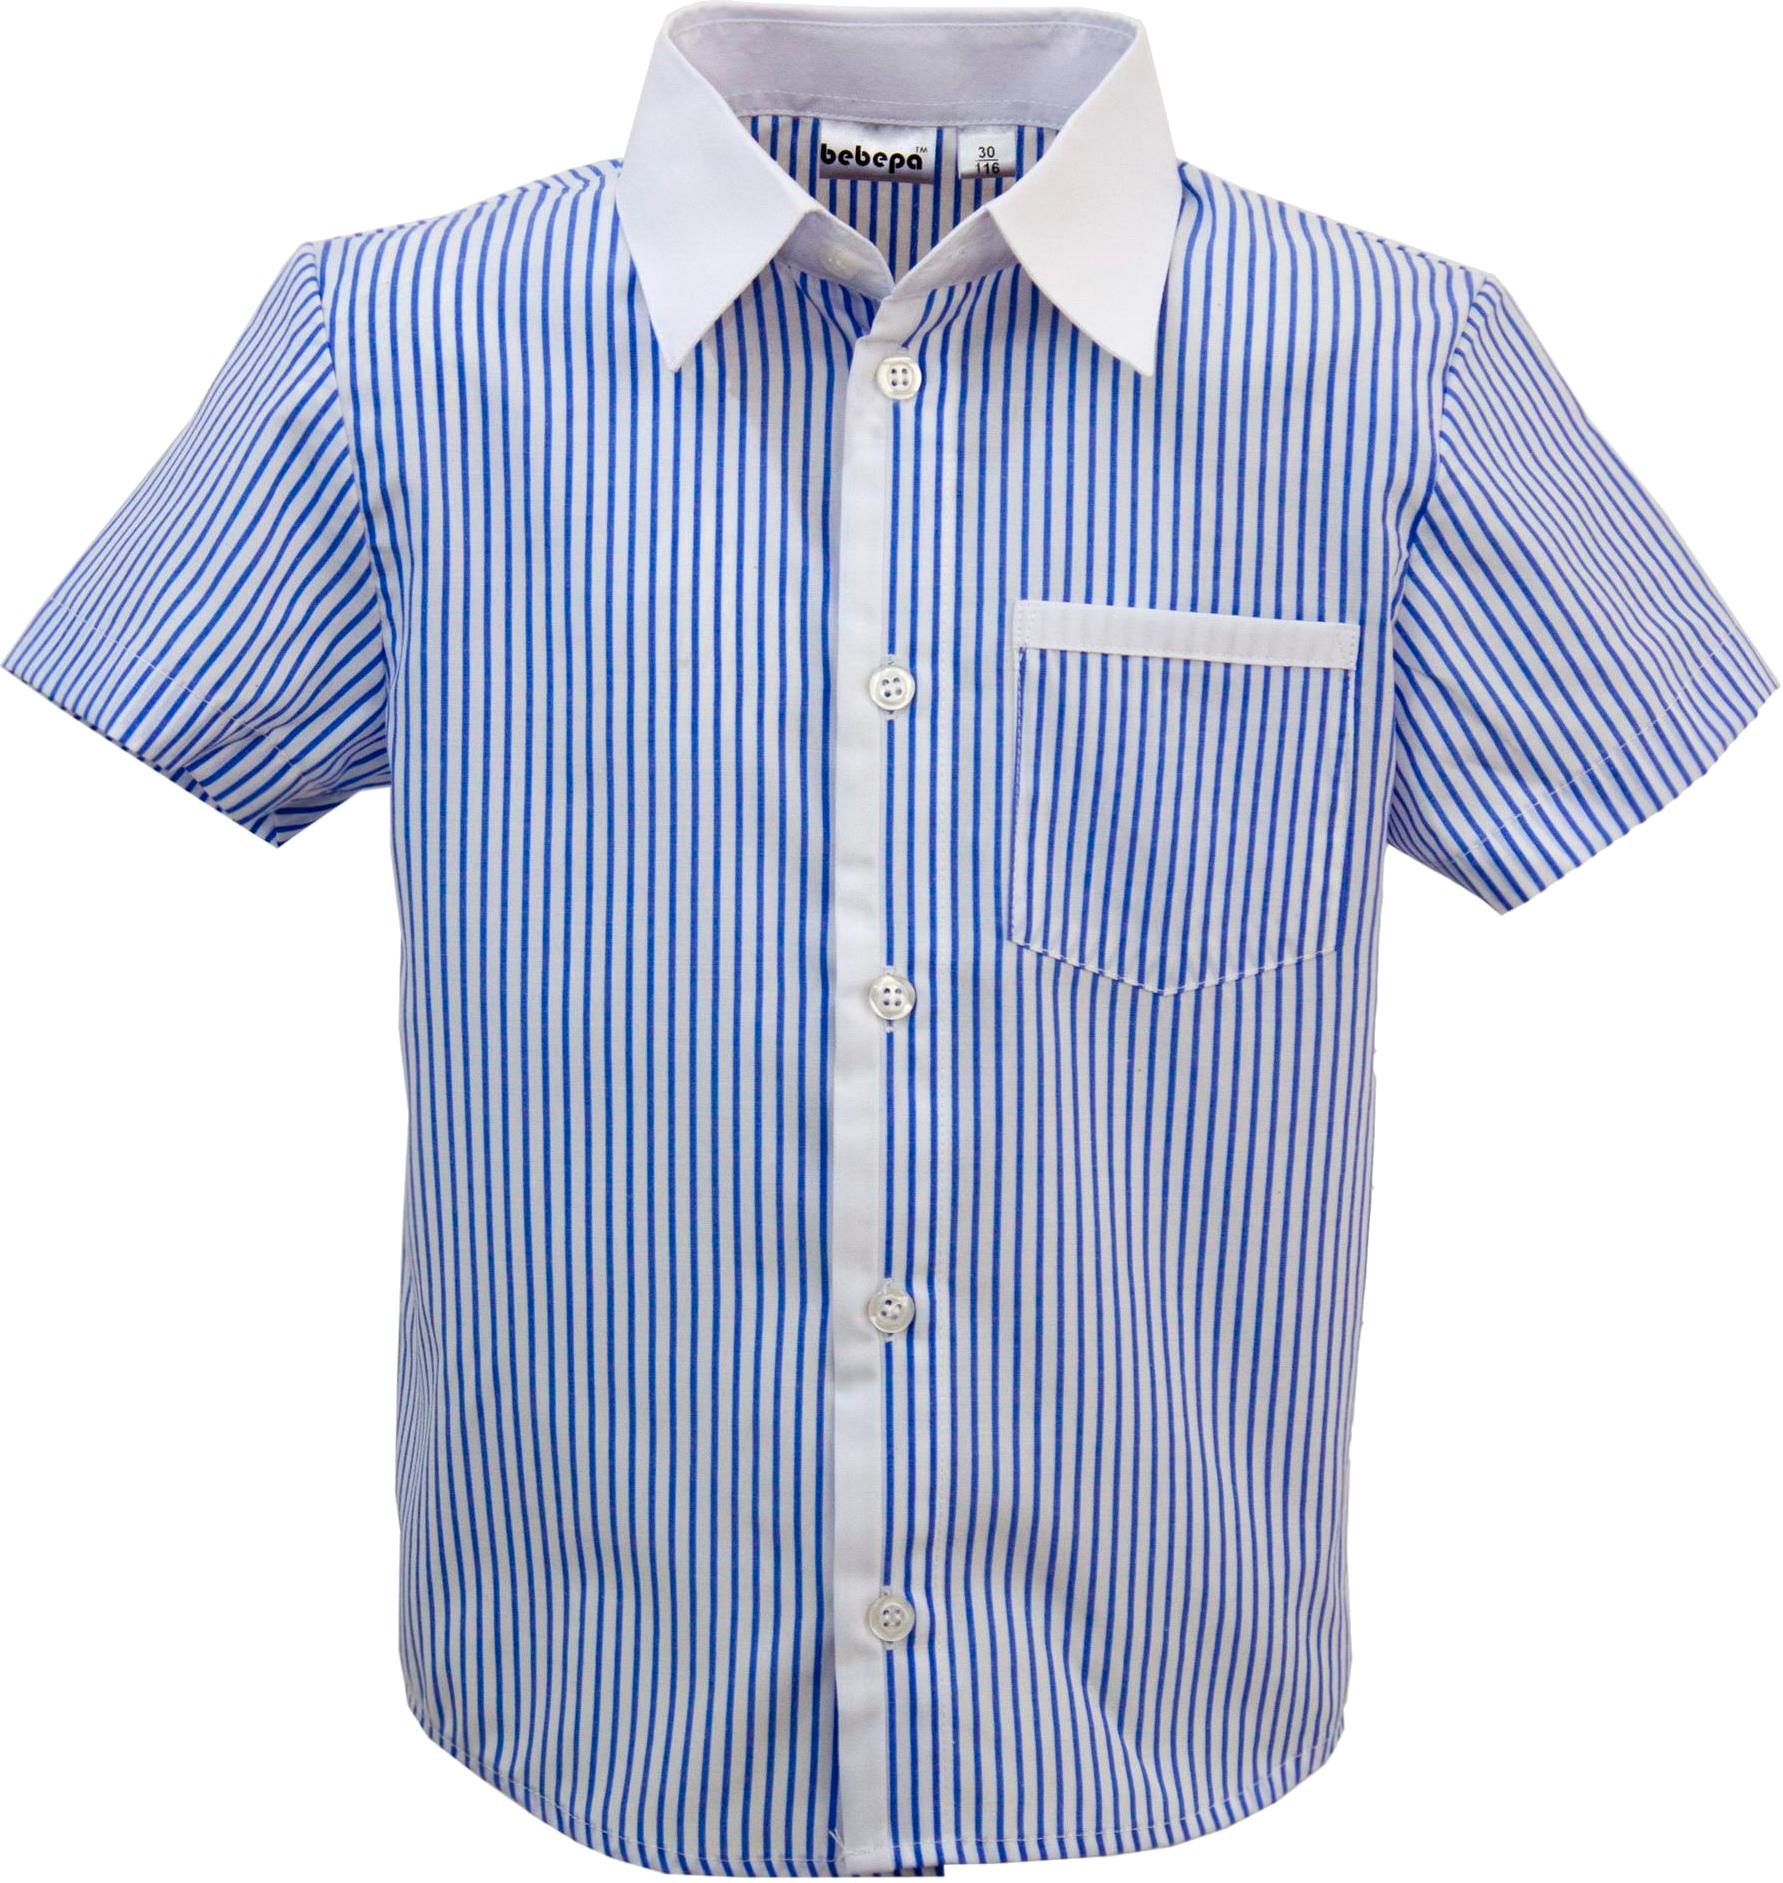 Formal half kid shirt. Dress clipart transparent background